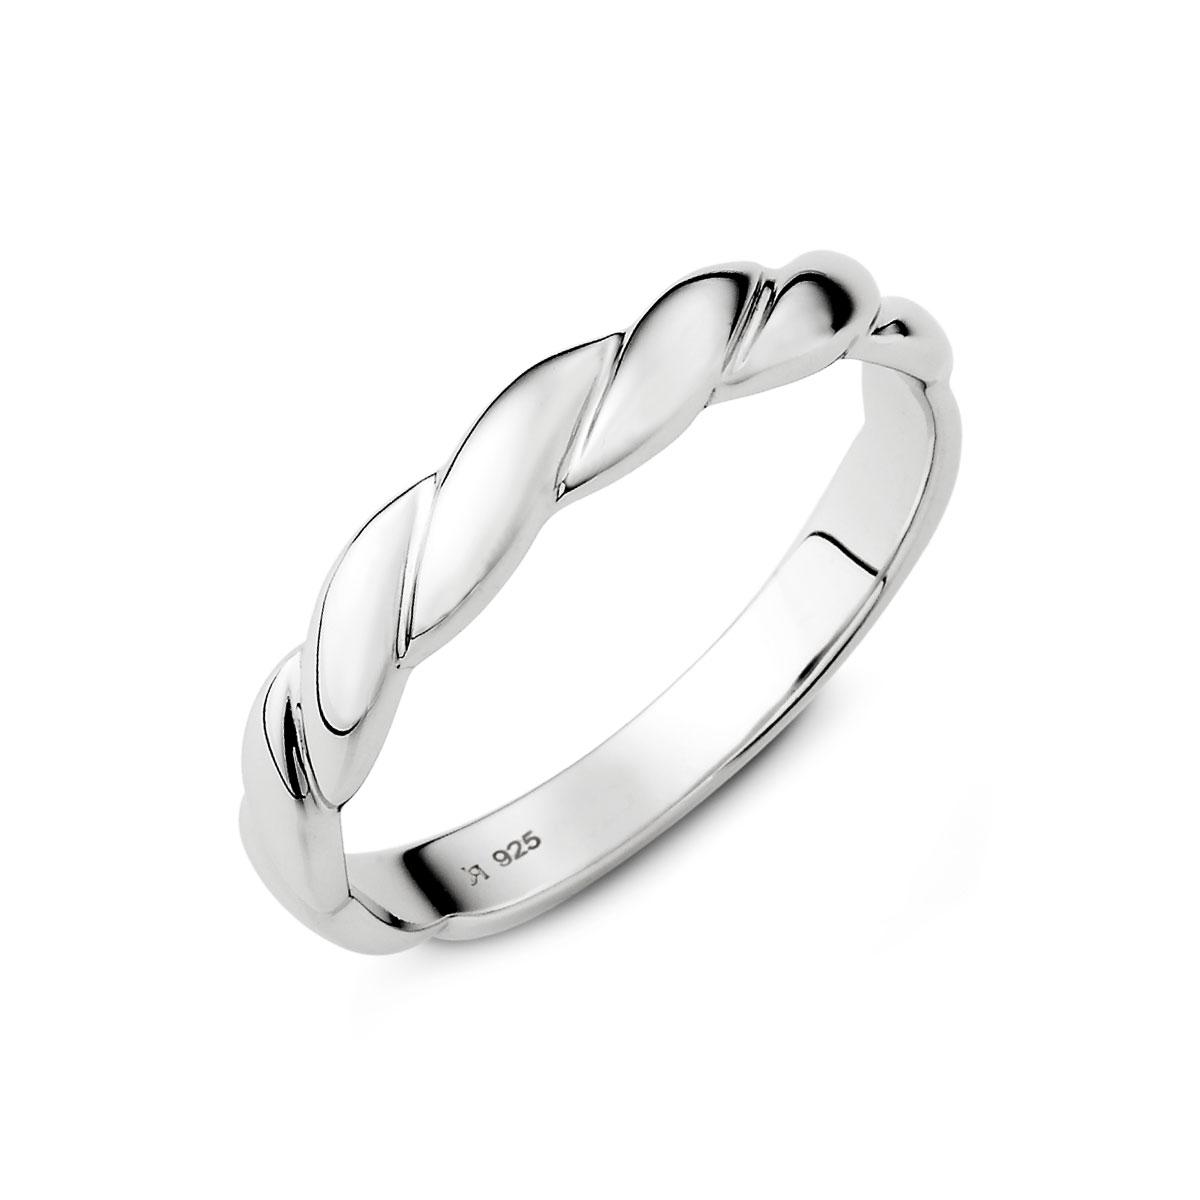 KSM47 愛交織捲花設計感戒指